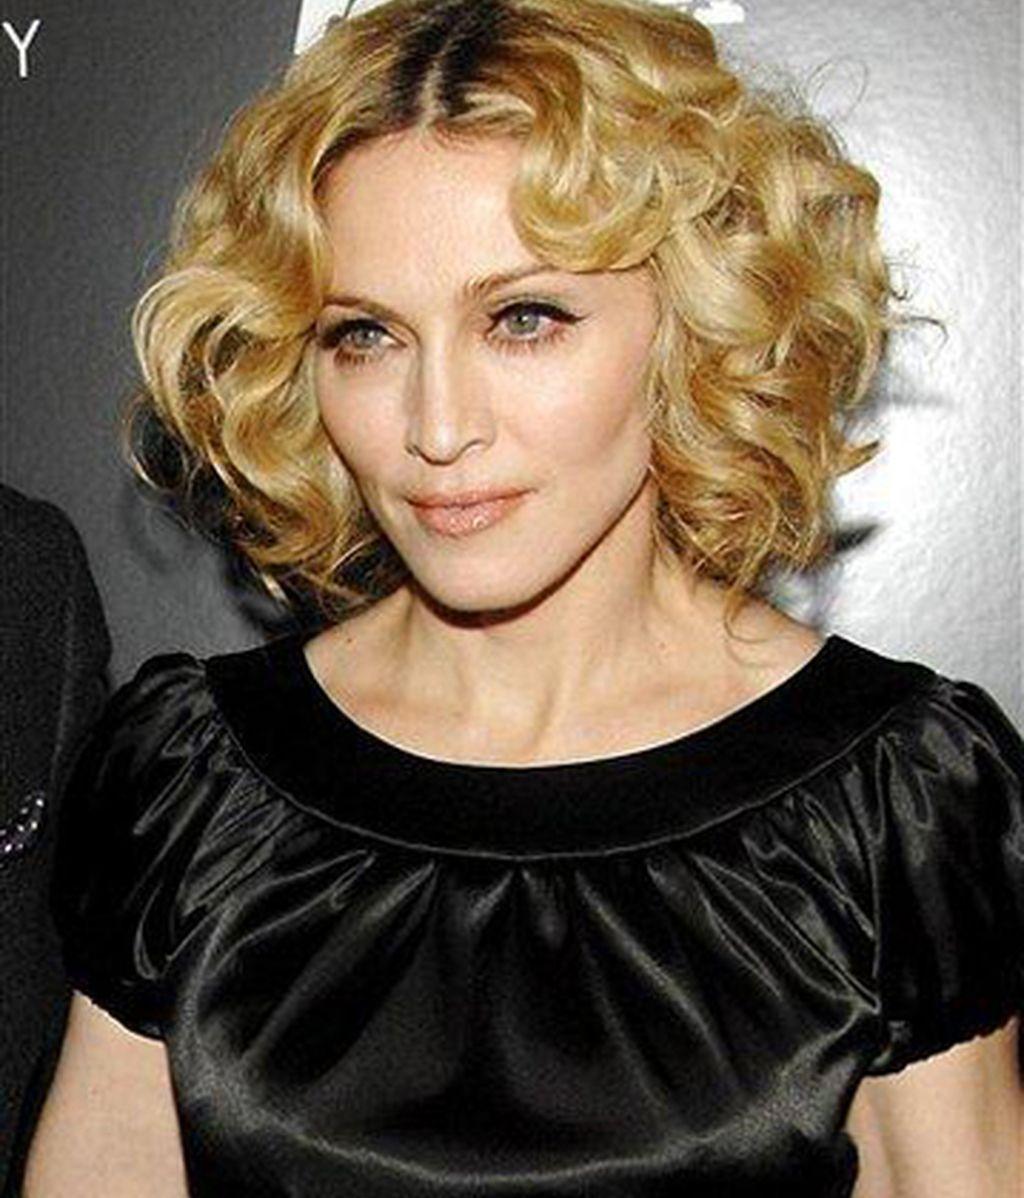 Madonna - Astrafobia